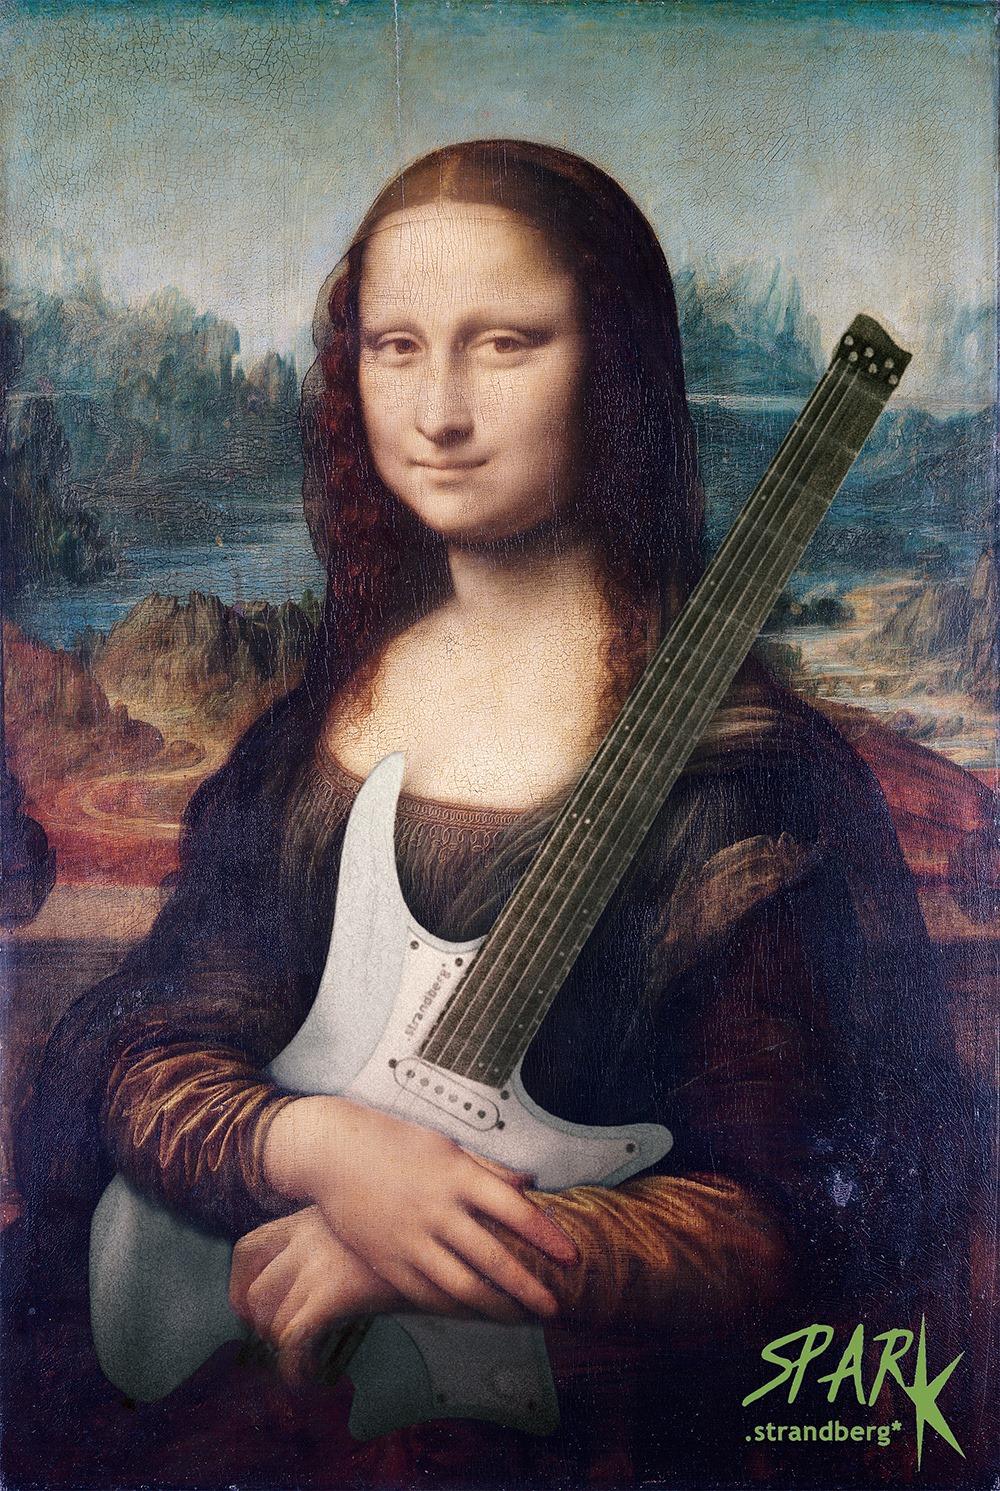 Mona Lisa holding a headless strandberg guitar